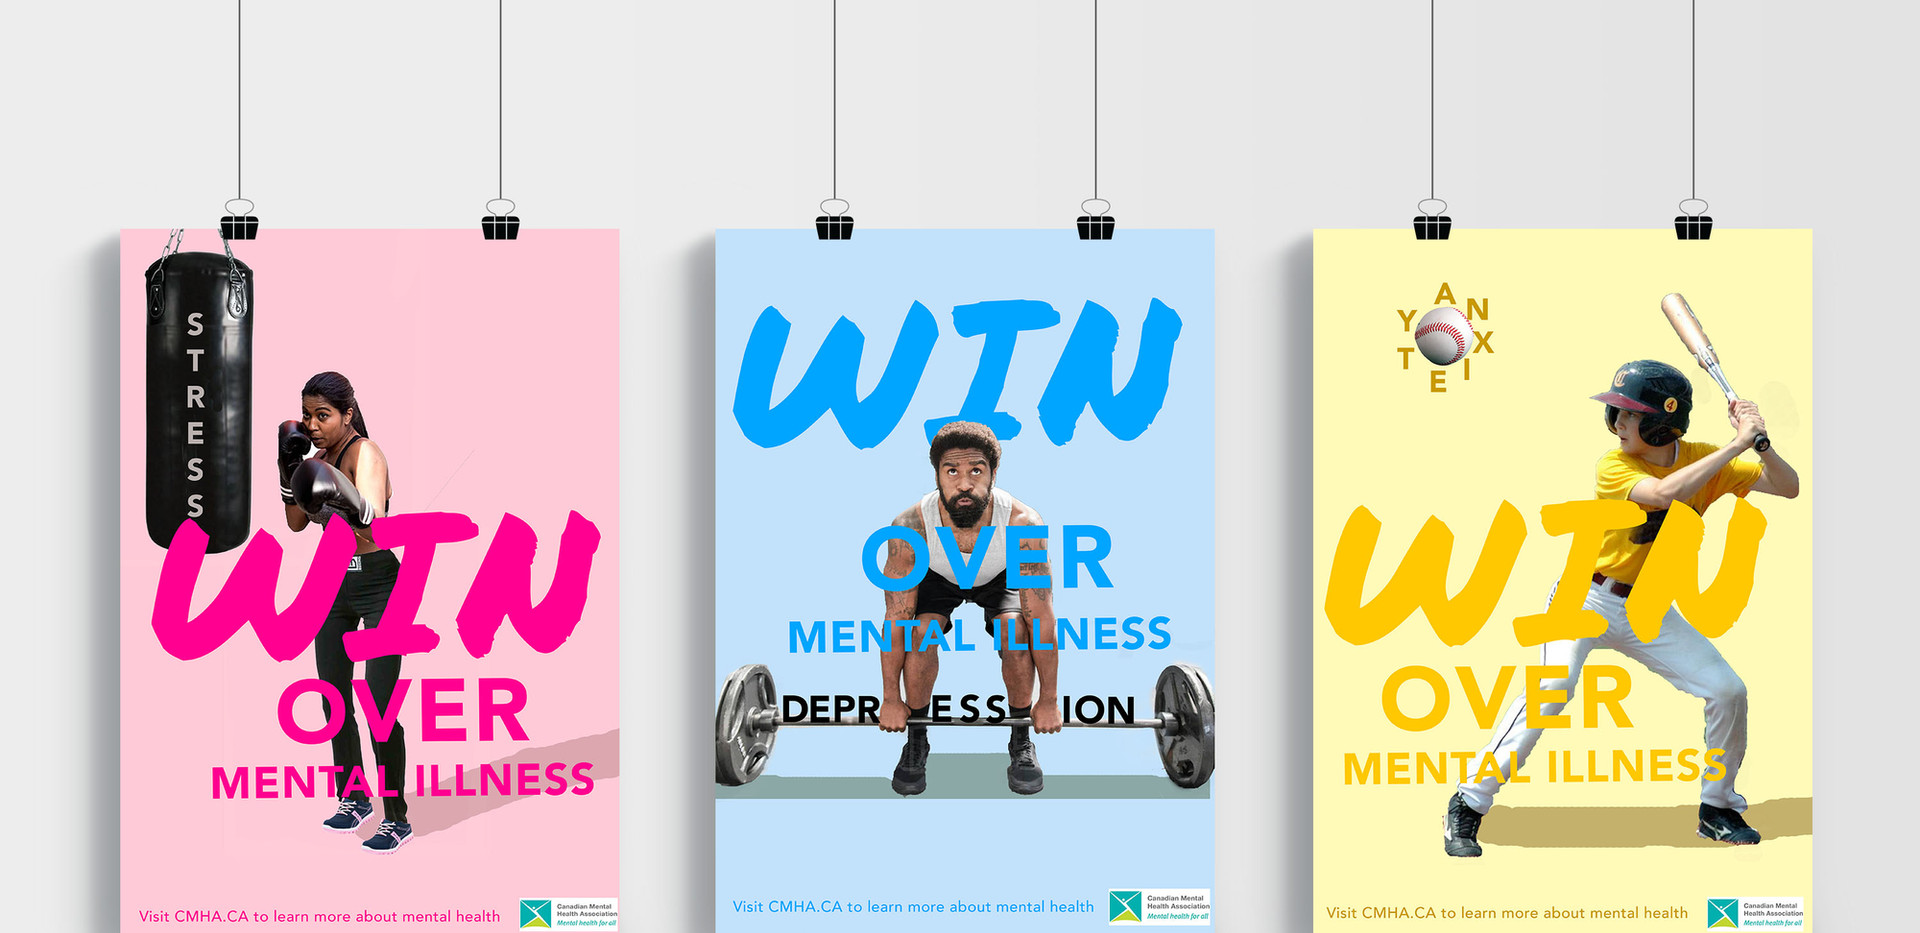 WIN over mental illness